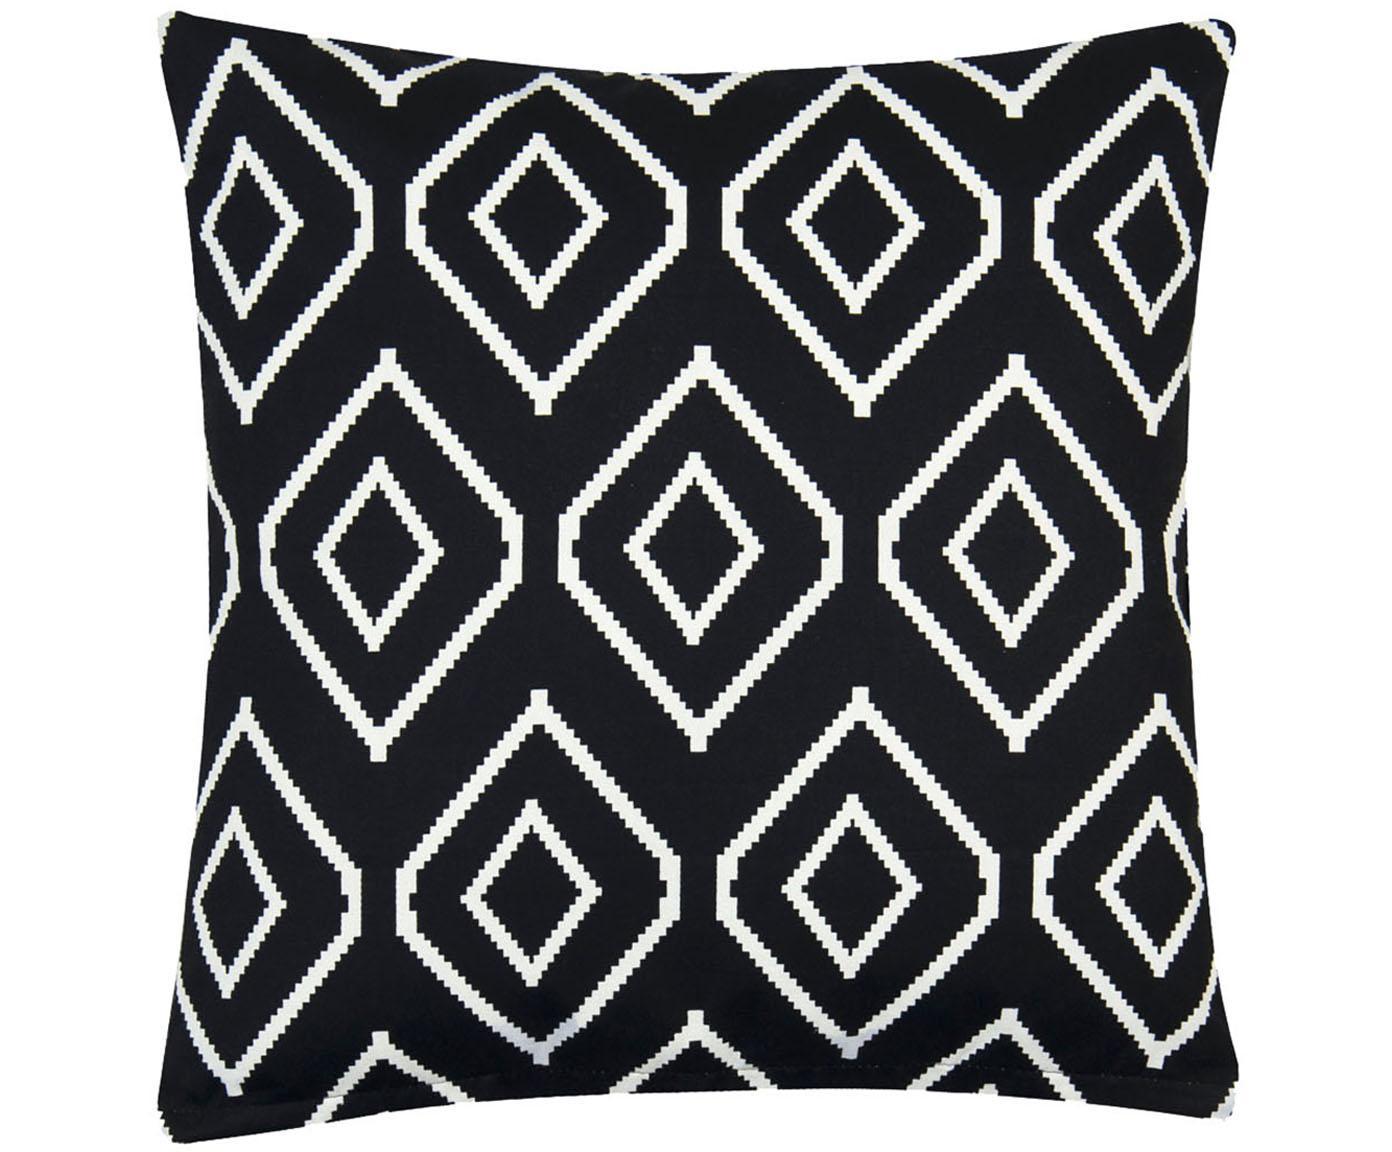 Federa arredo in nero/bianco Gracie, Cotone, tessuto panama, Nero, crema, Larg. 40 x Lung. 40 cm